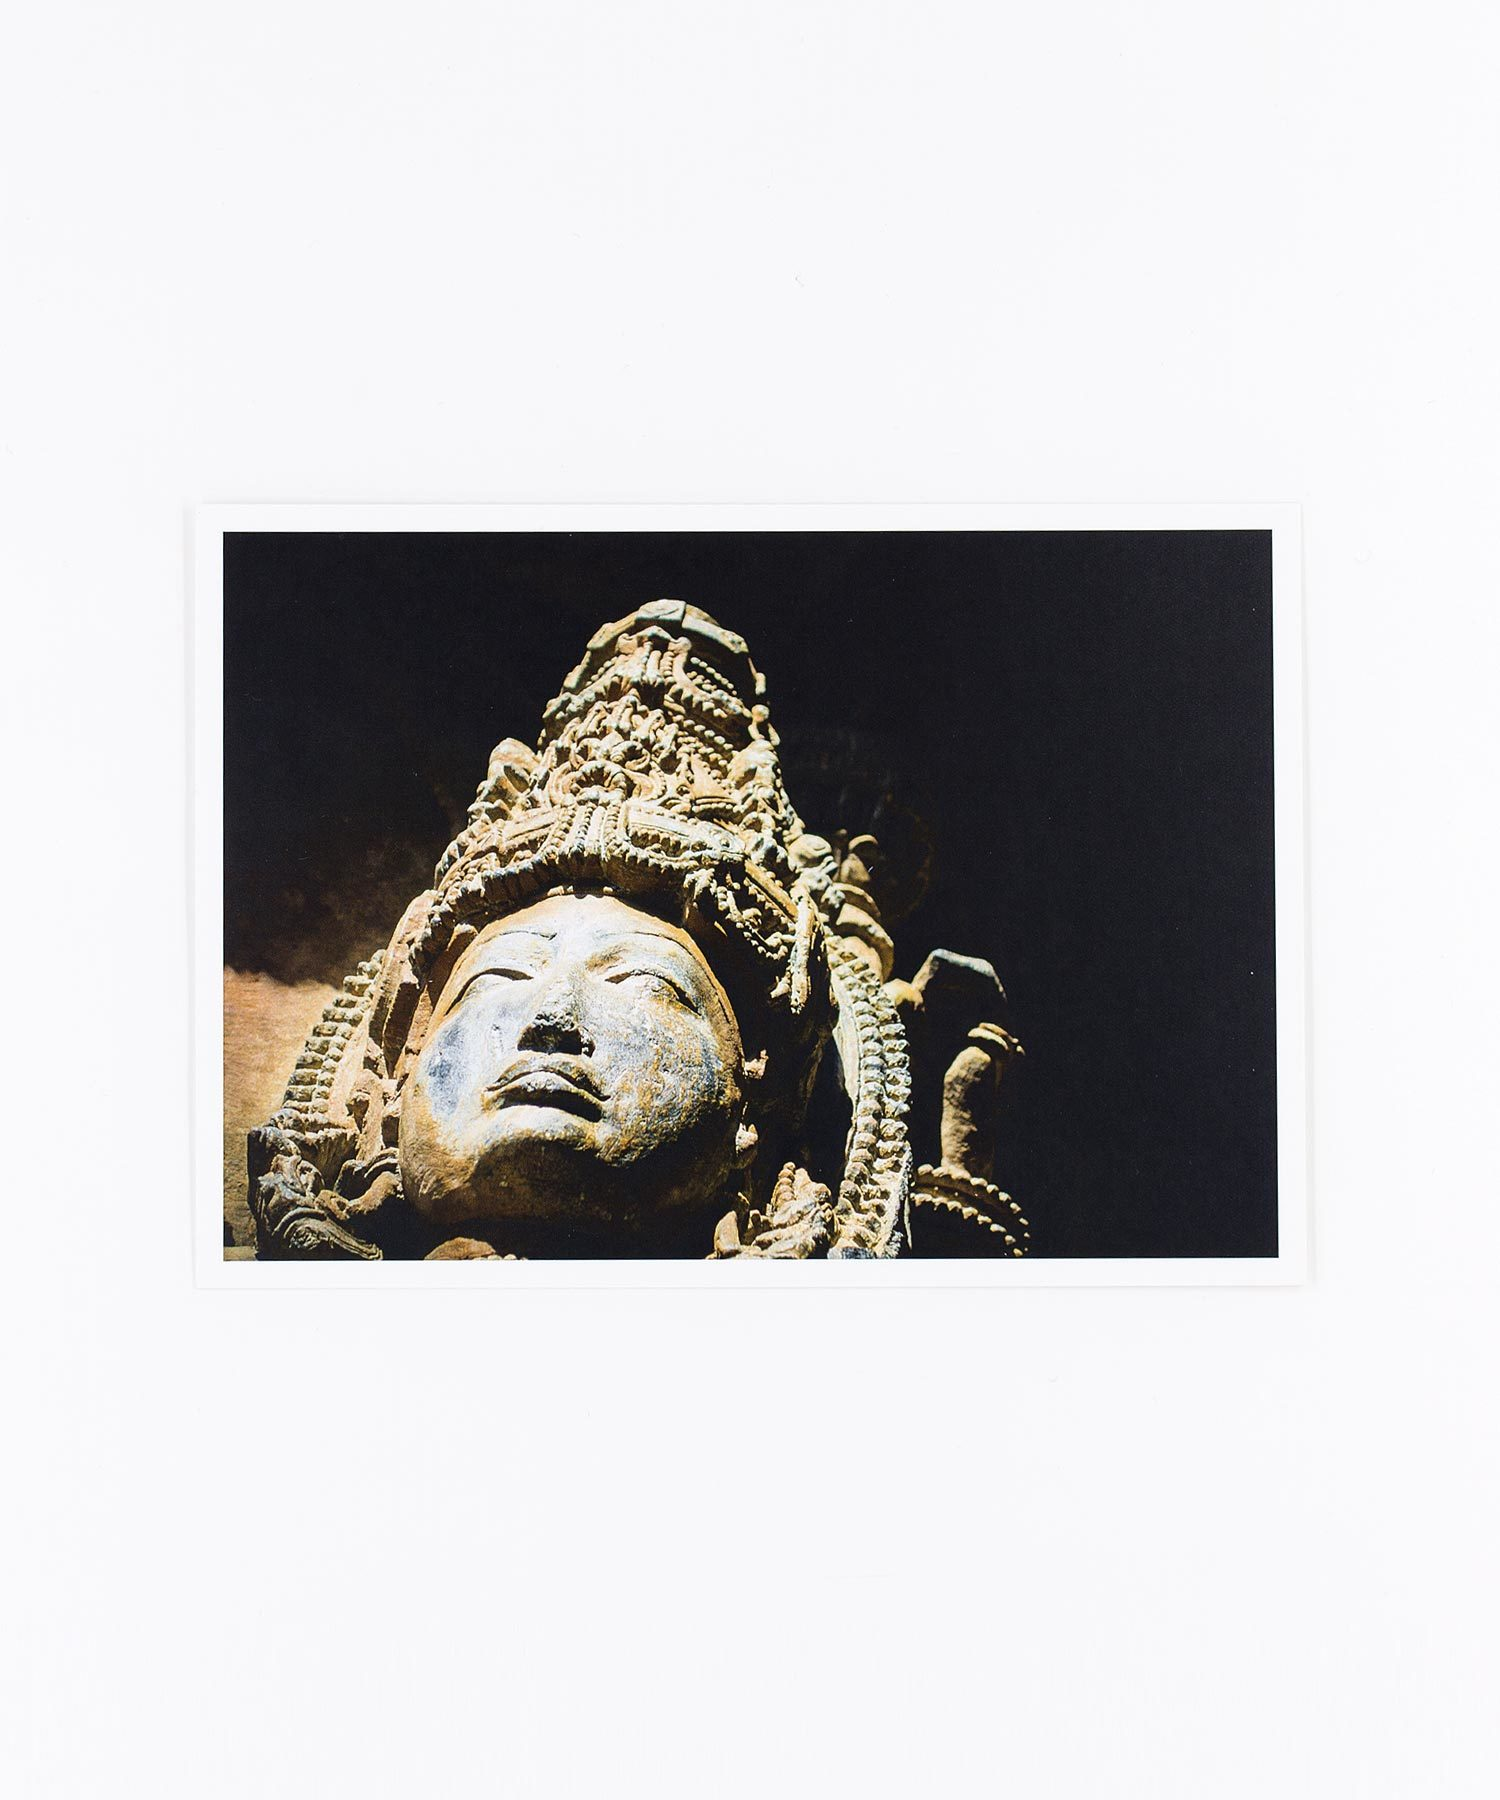 Fotopostkarte Parvati